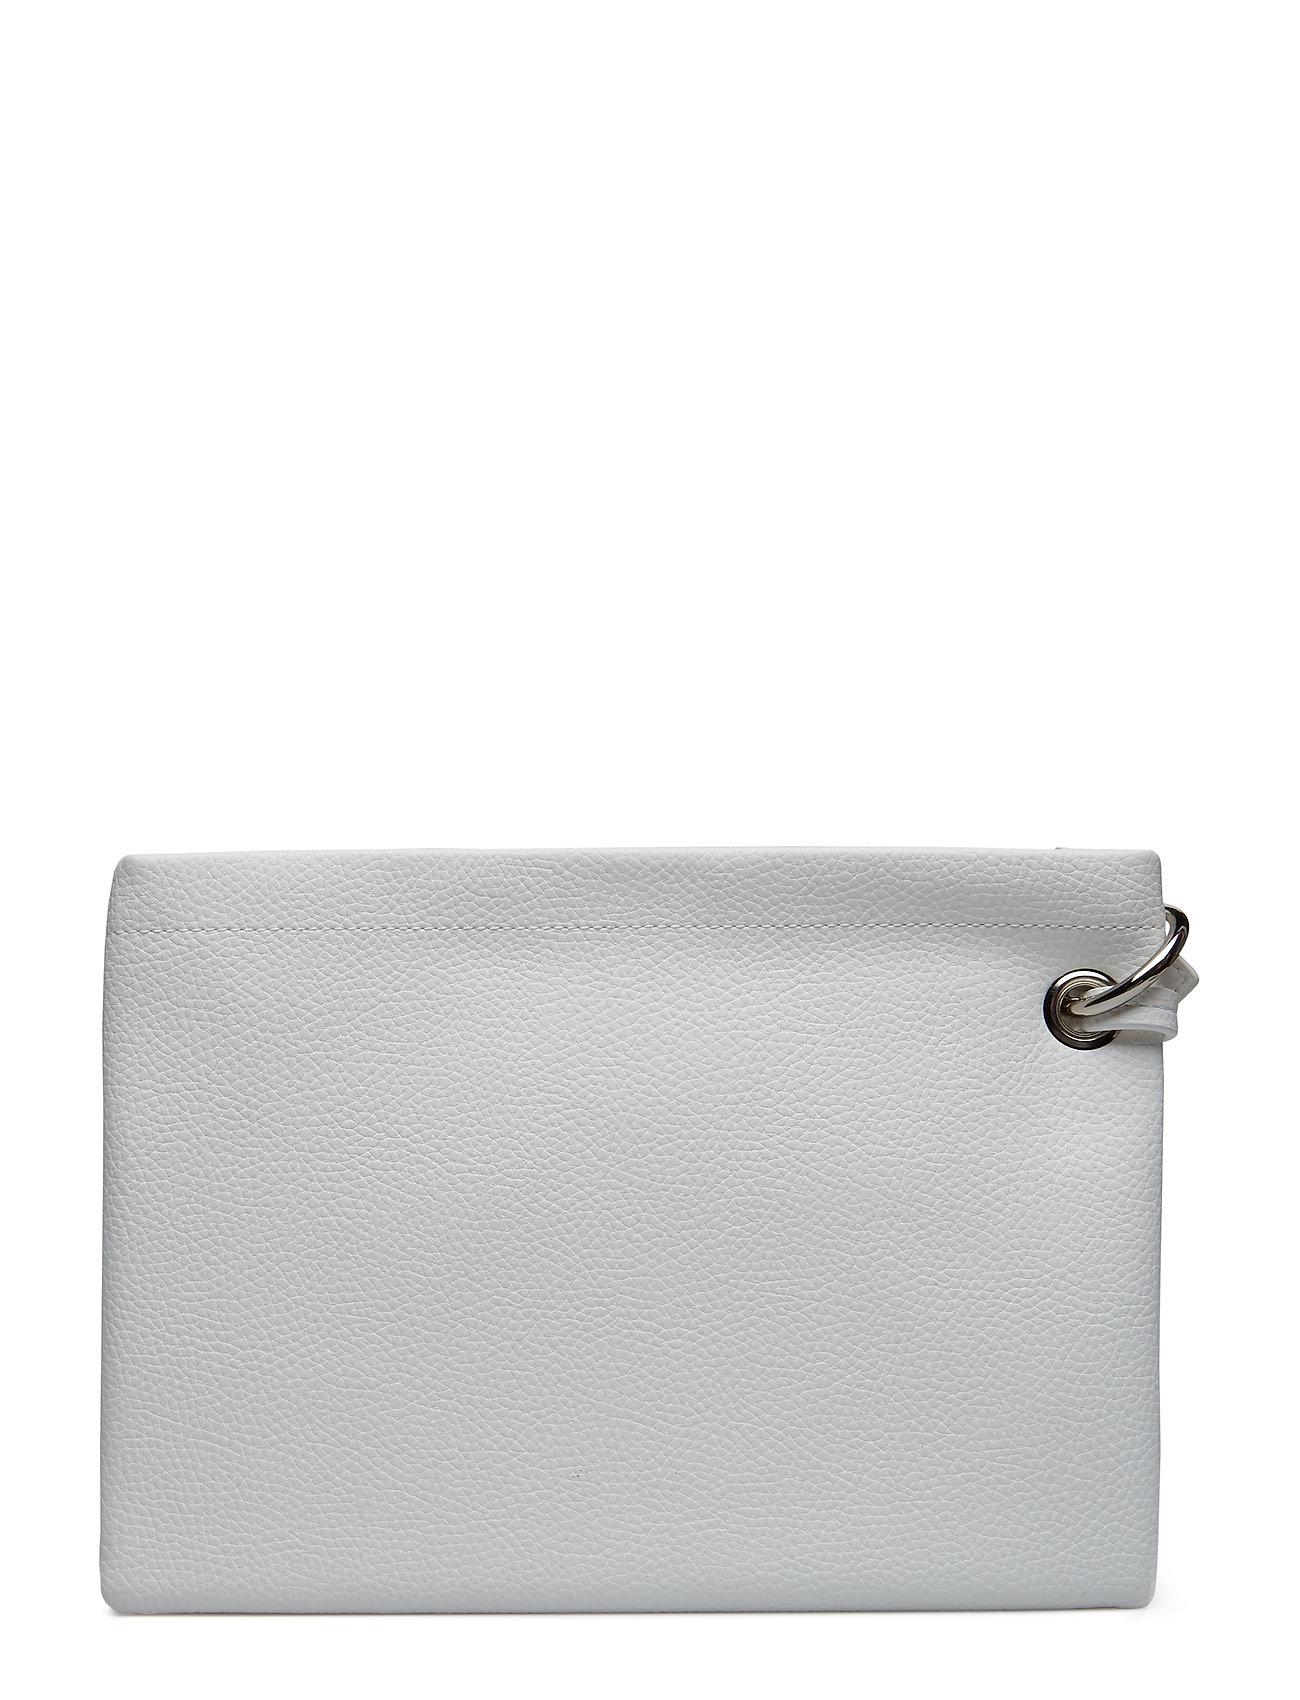 WhiteCalvin Pbright Medium Klein Banner Logo 1KTclFJ